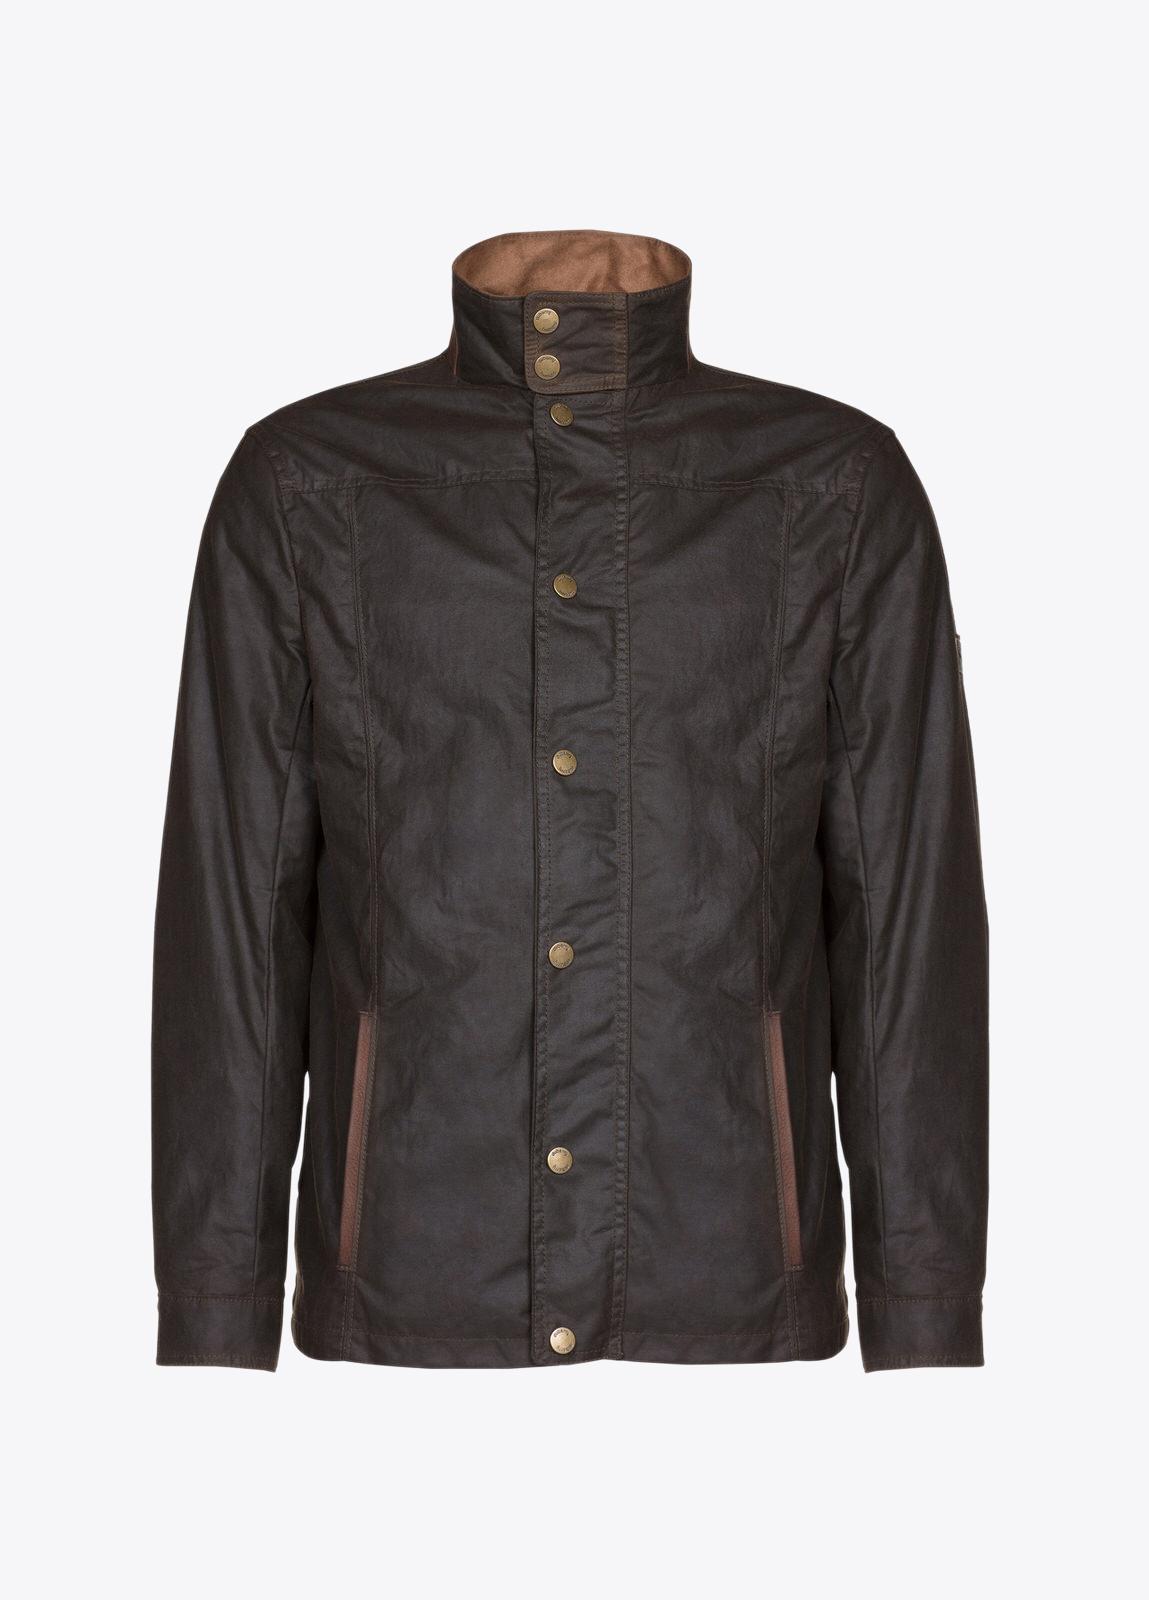 Carrickfergus Waxed Jacket - Olive